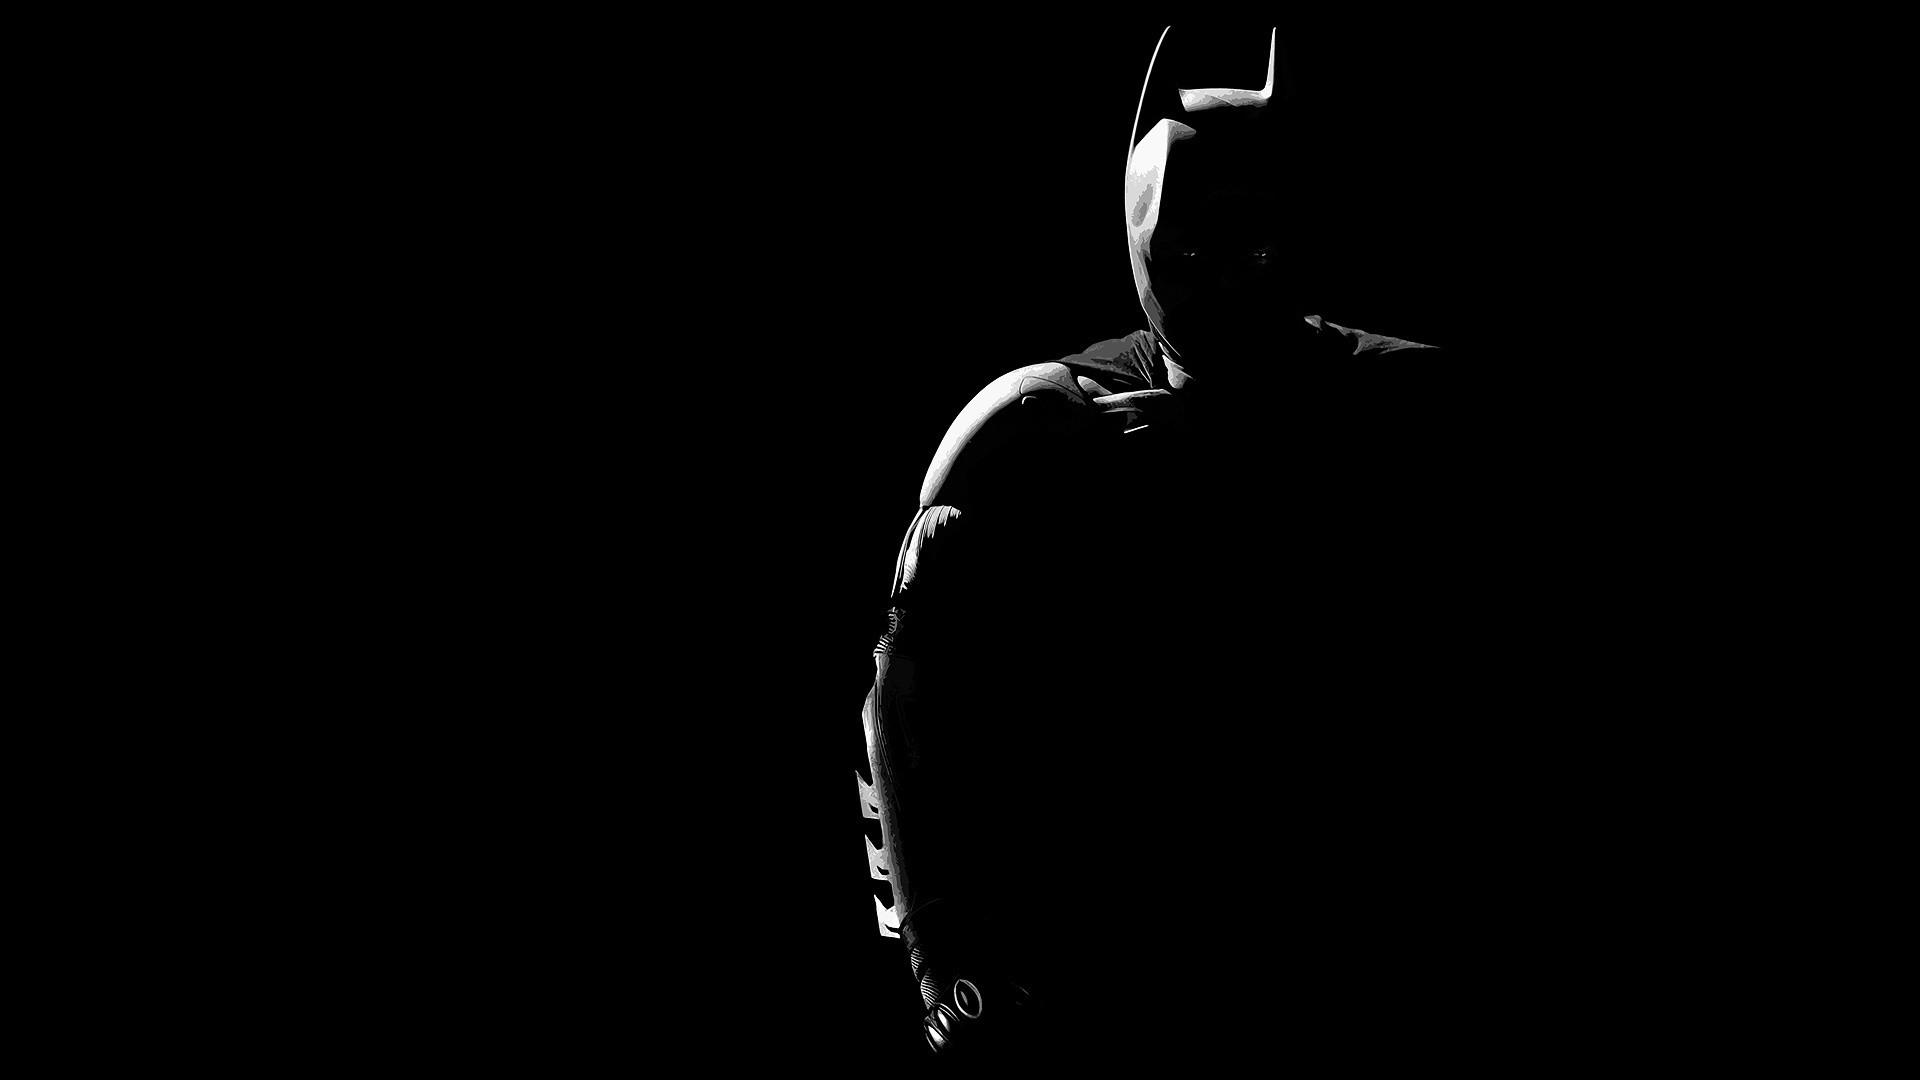 Res: 1920x1080, Batman Dark Silhouette Desktop Wallpaper Uploaded by egoman